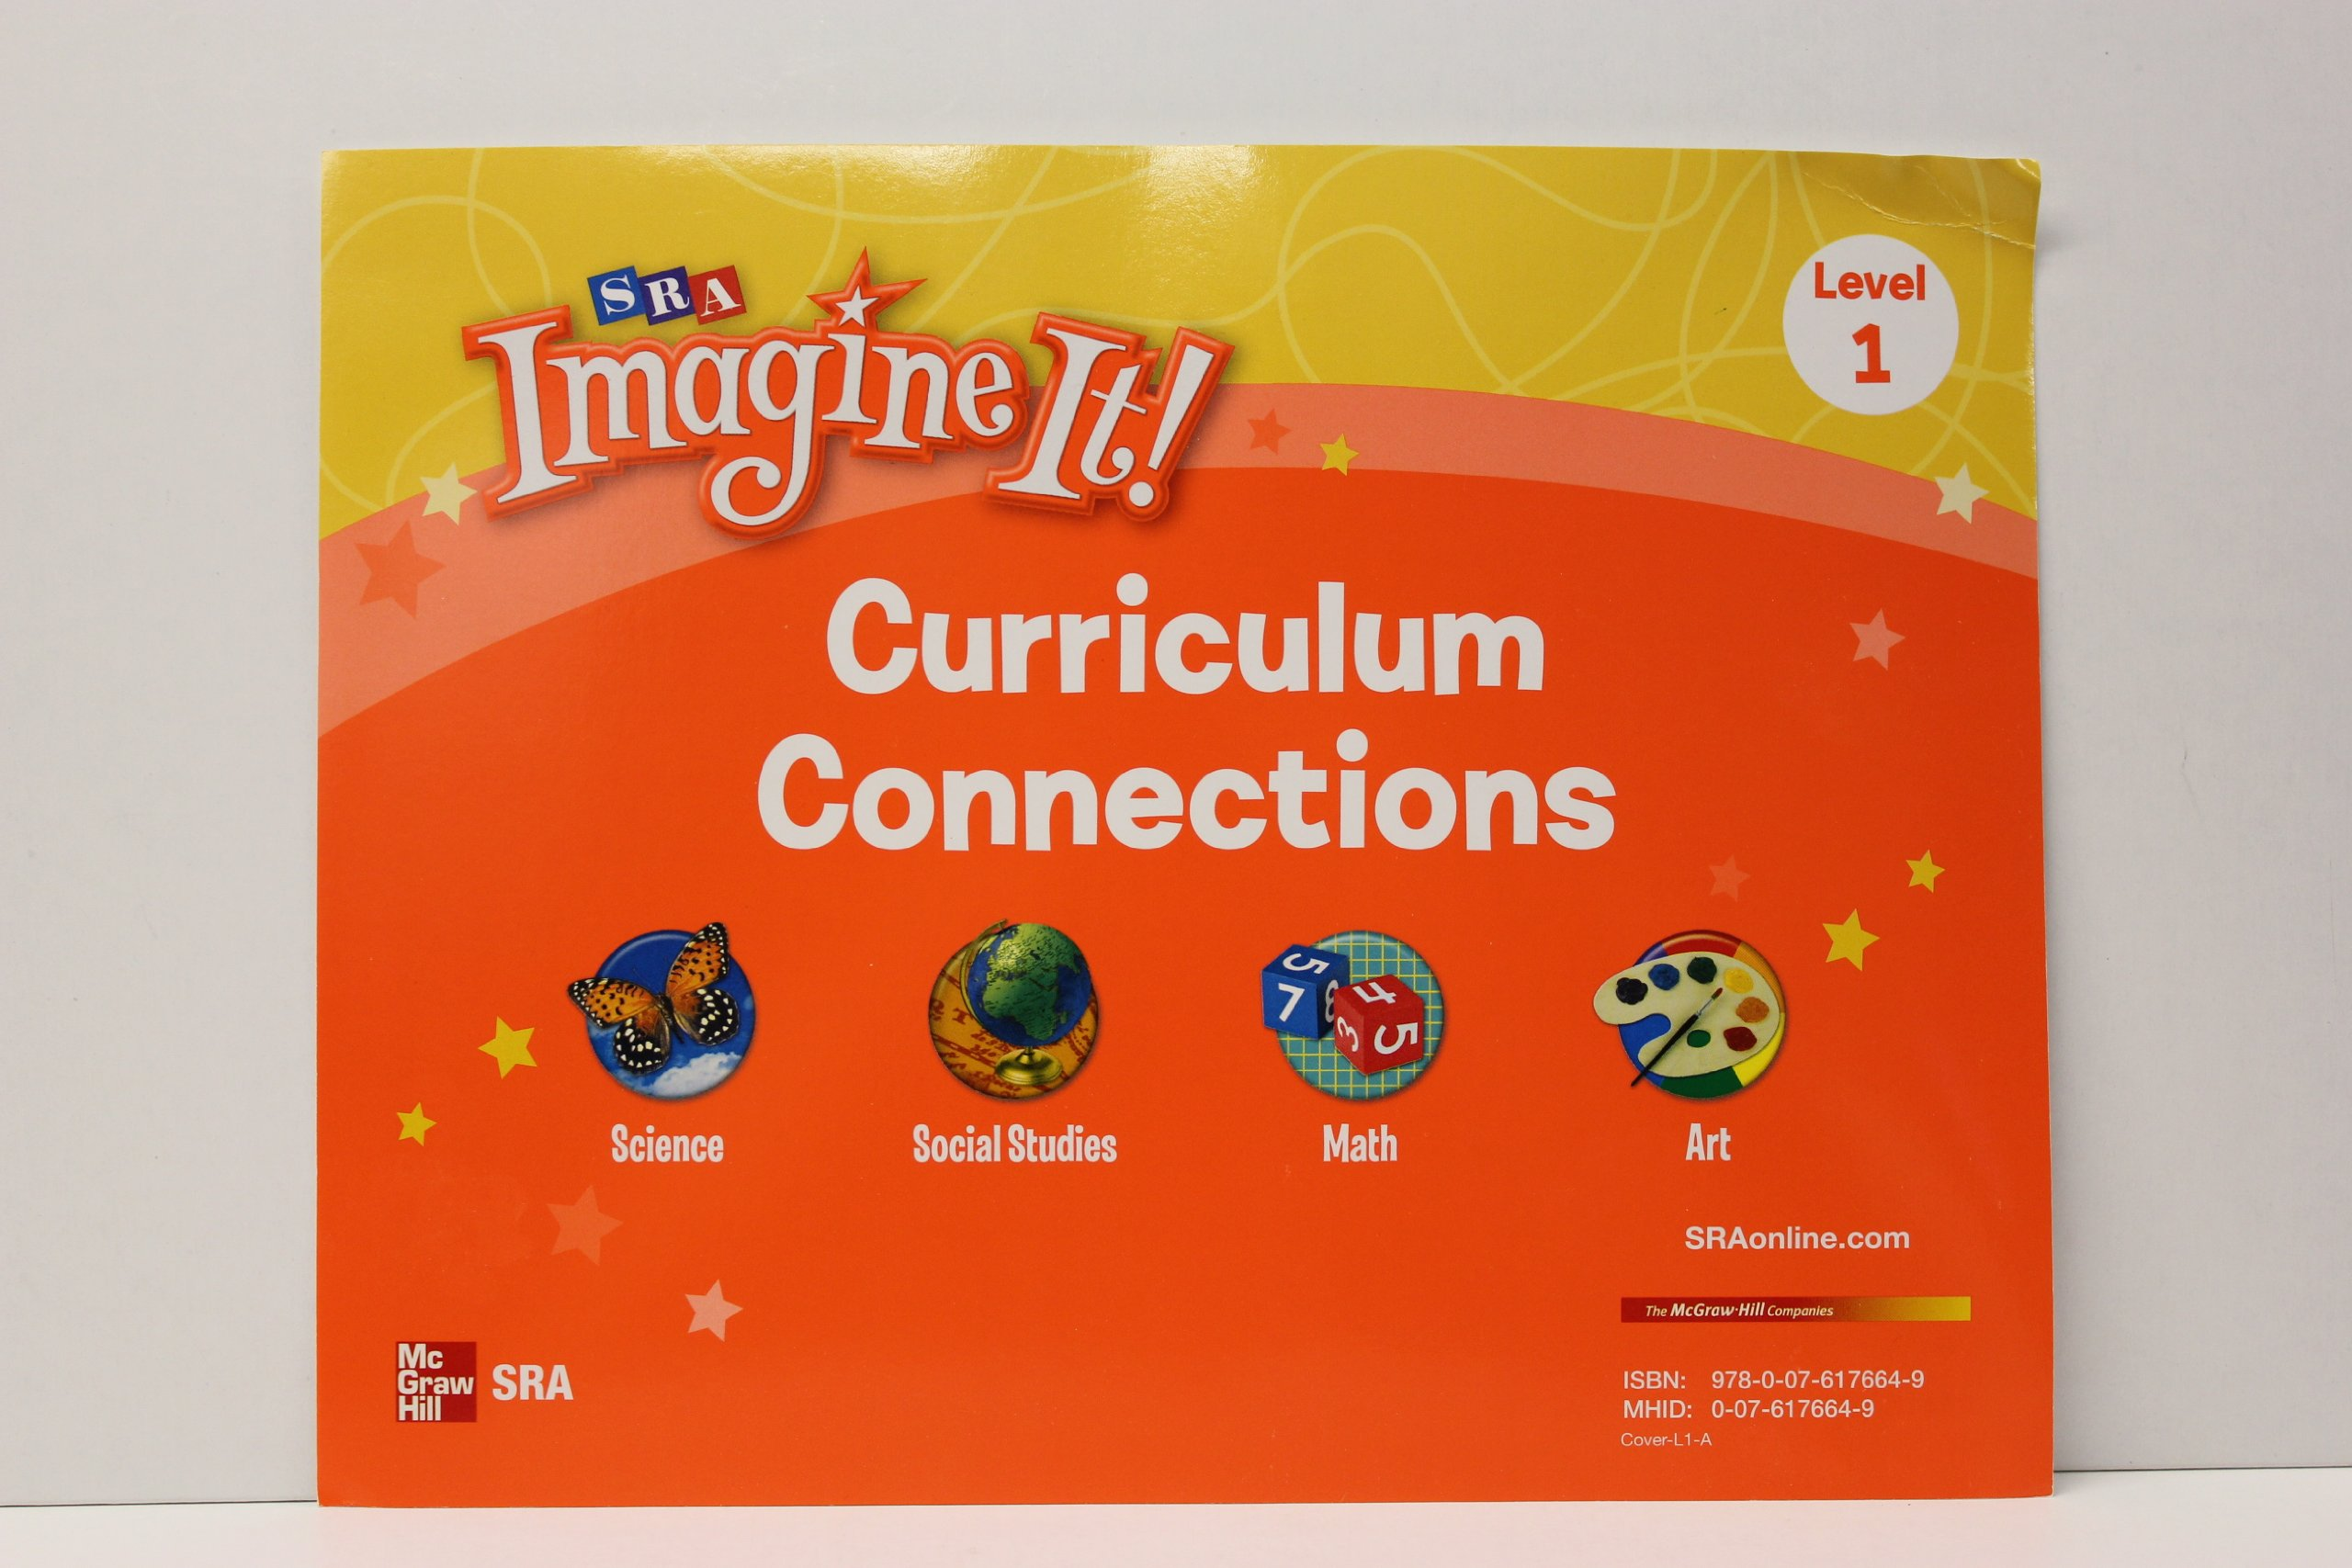 Imagine It!, SRA Imagine It! - Curriculum Connections - Grade 1 - Science, Social Studies, Math, Art PDF